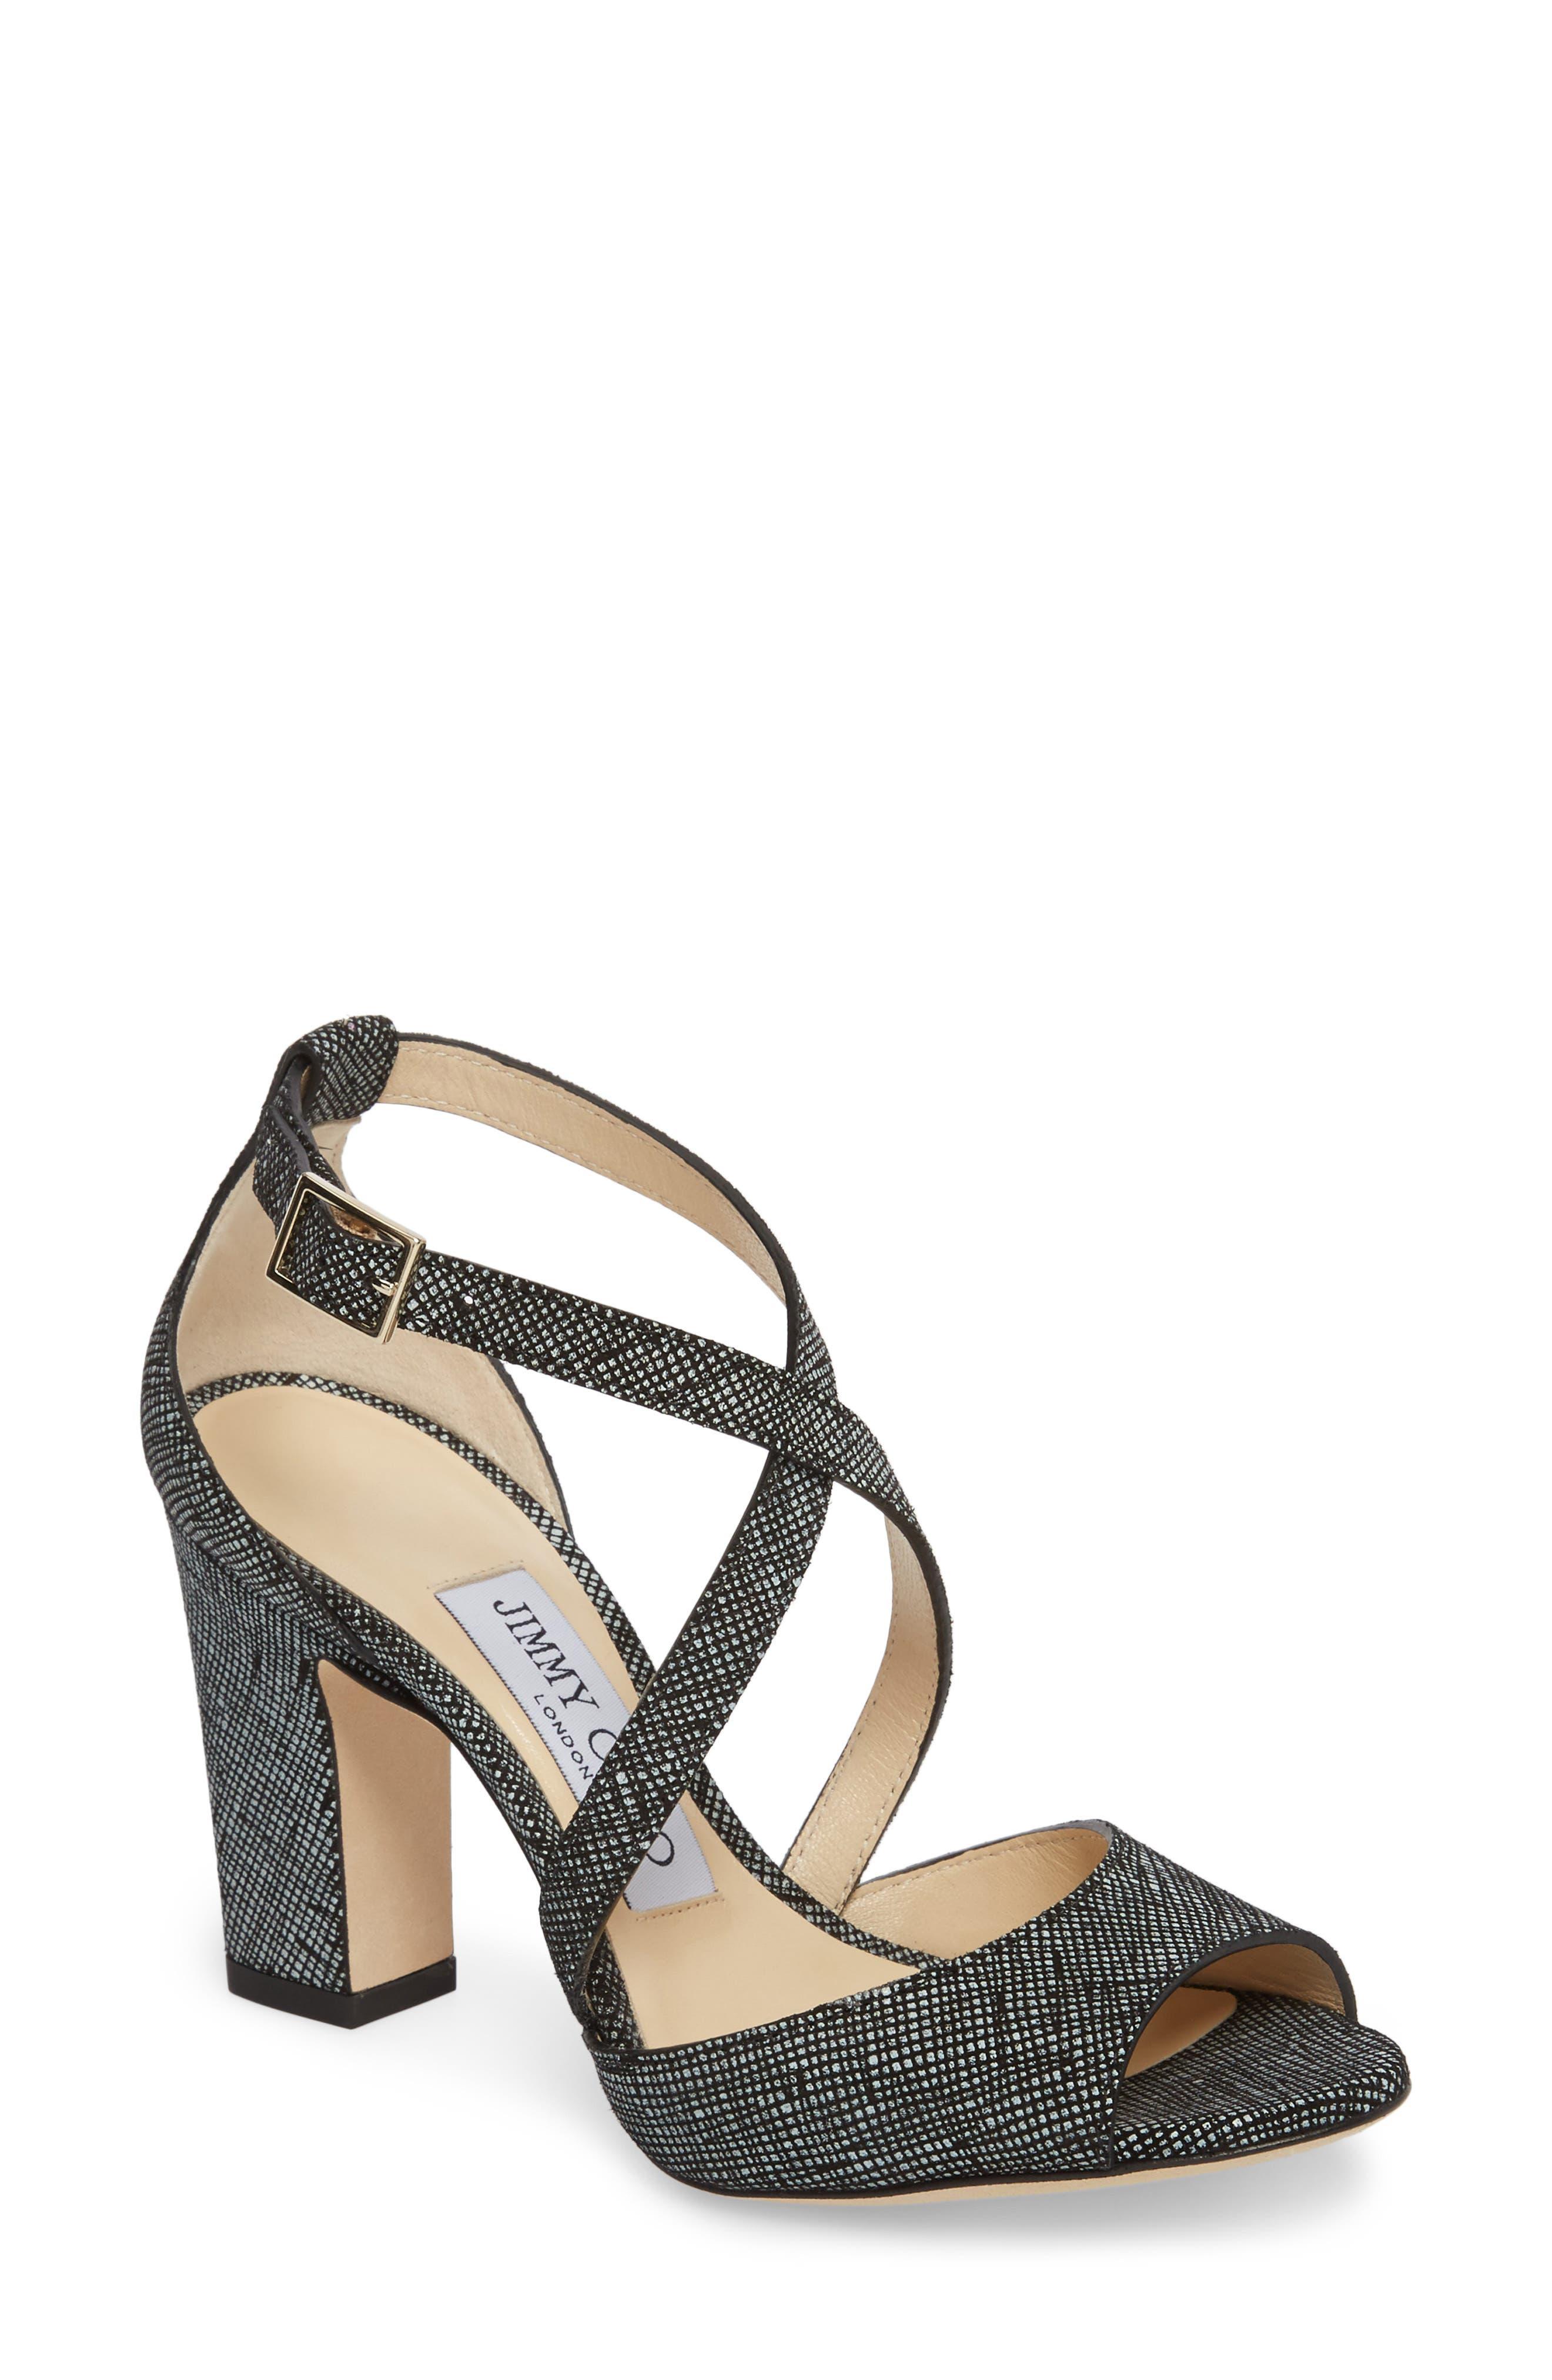 Main Image - Jimmy Choo Carrie Cross Strap Sandal (Women)